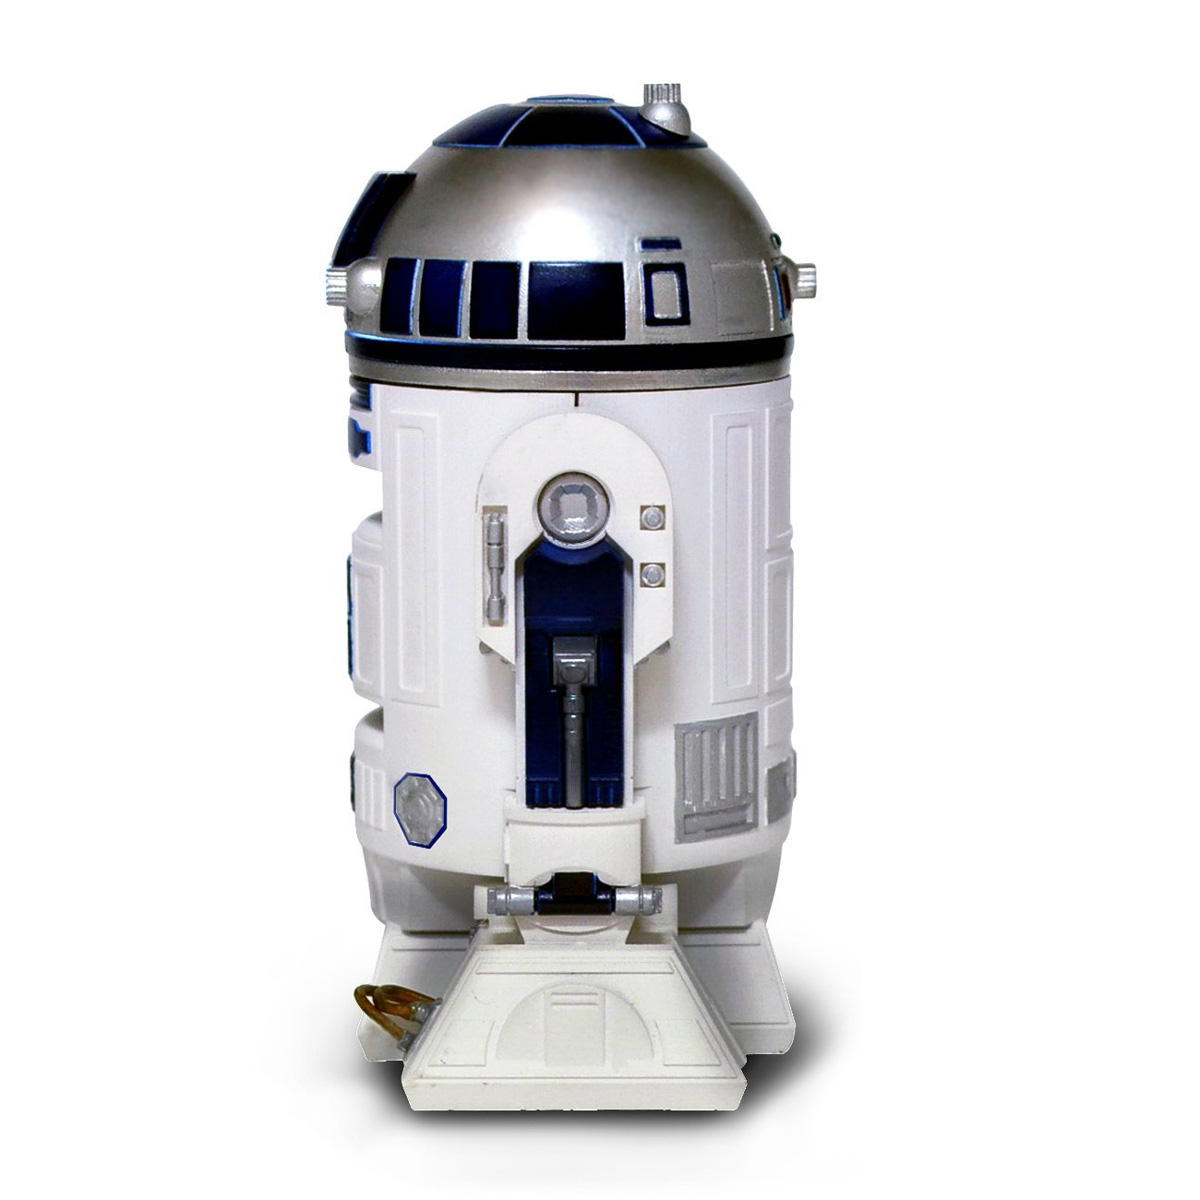 R2 D2 Virtual Keyboard The Green Head